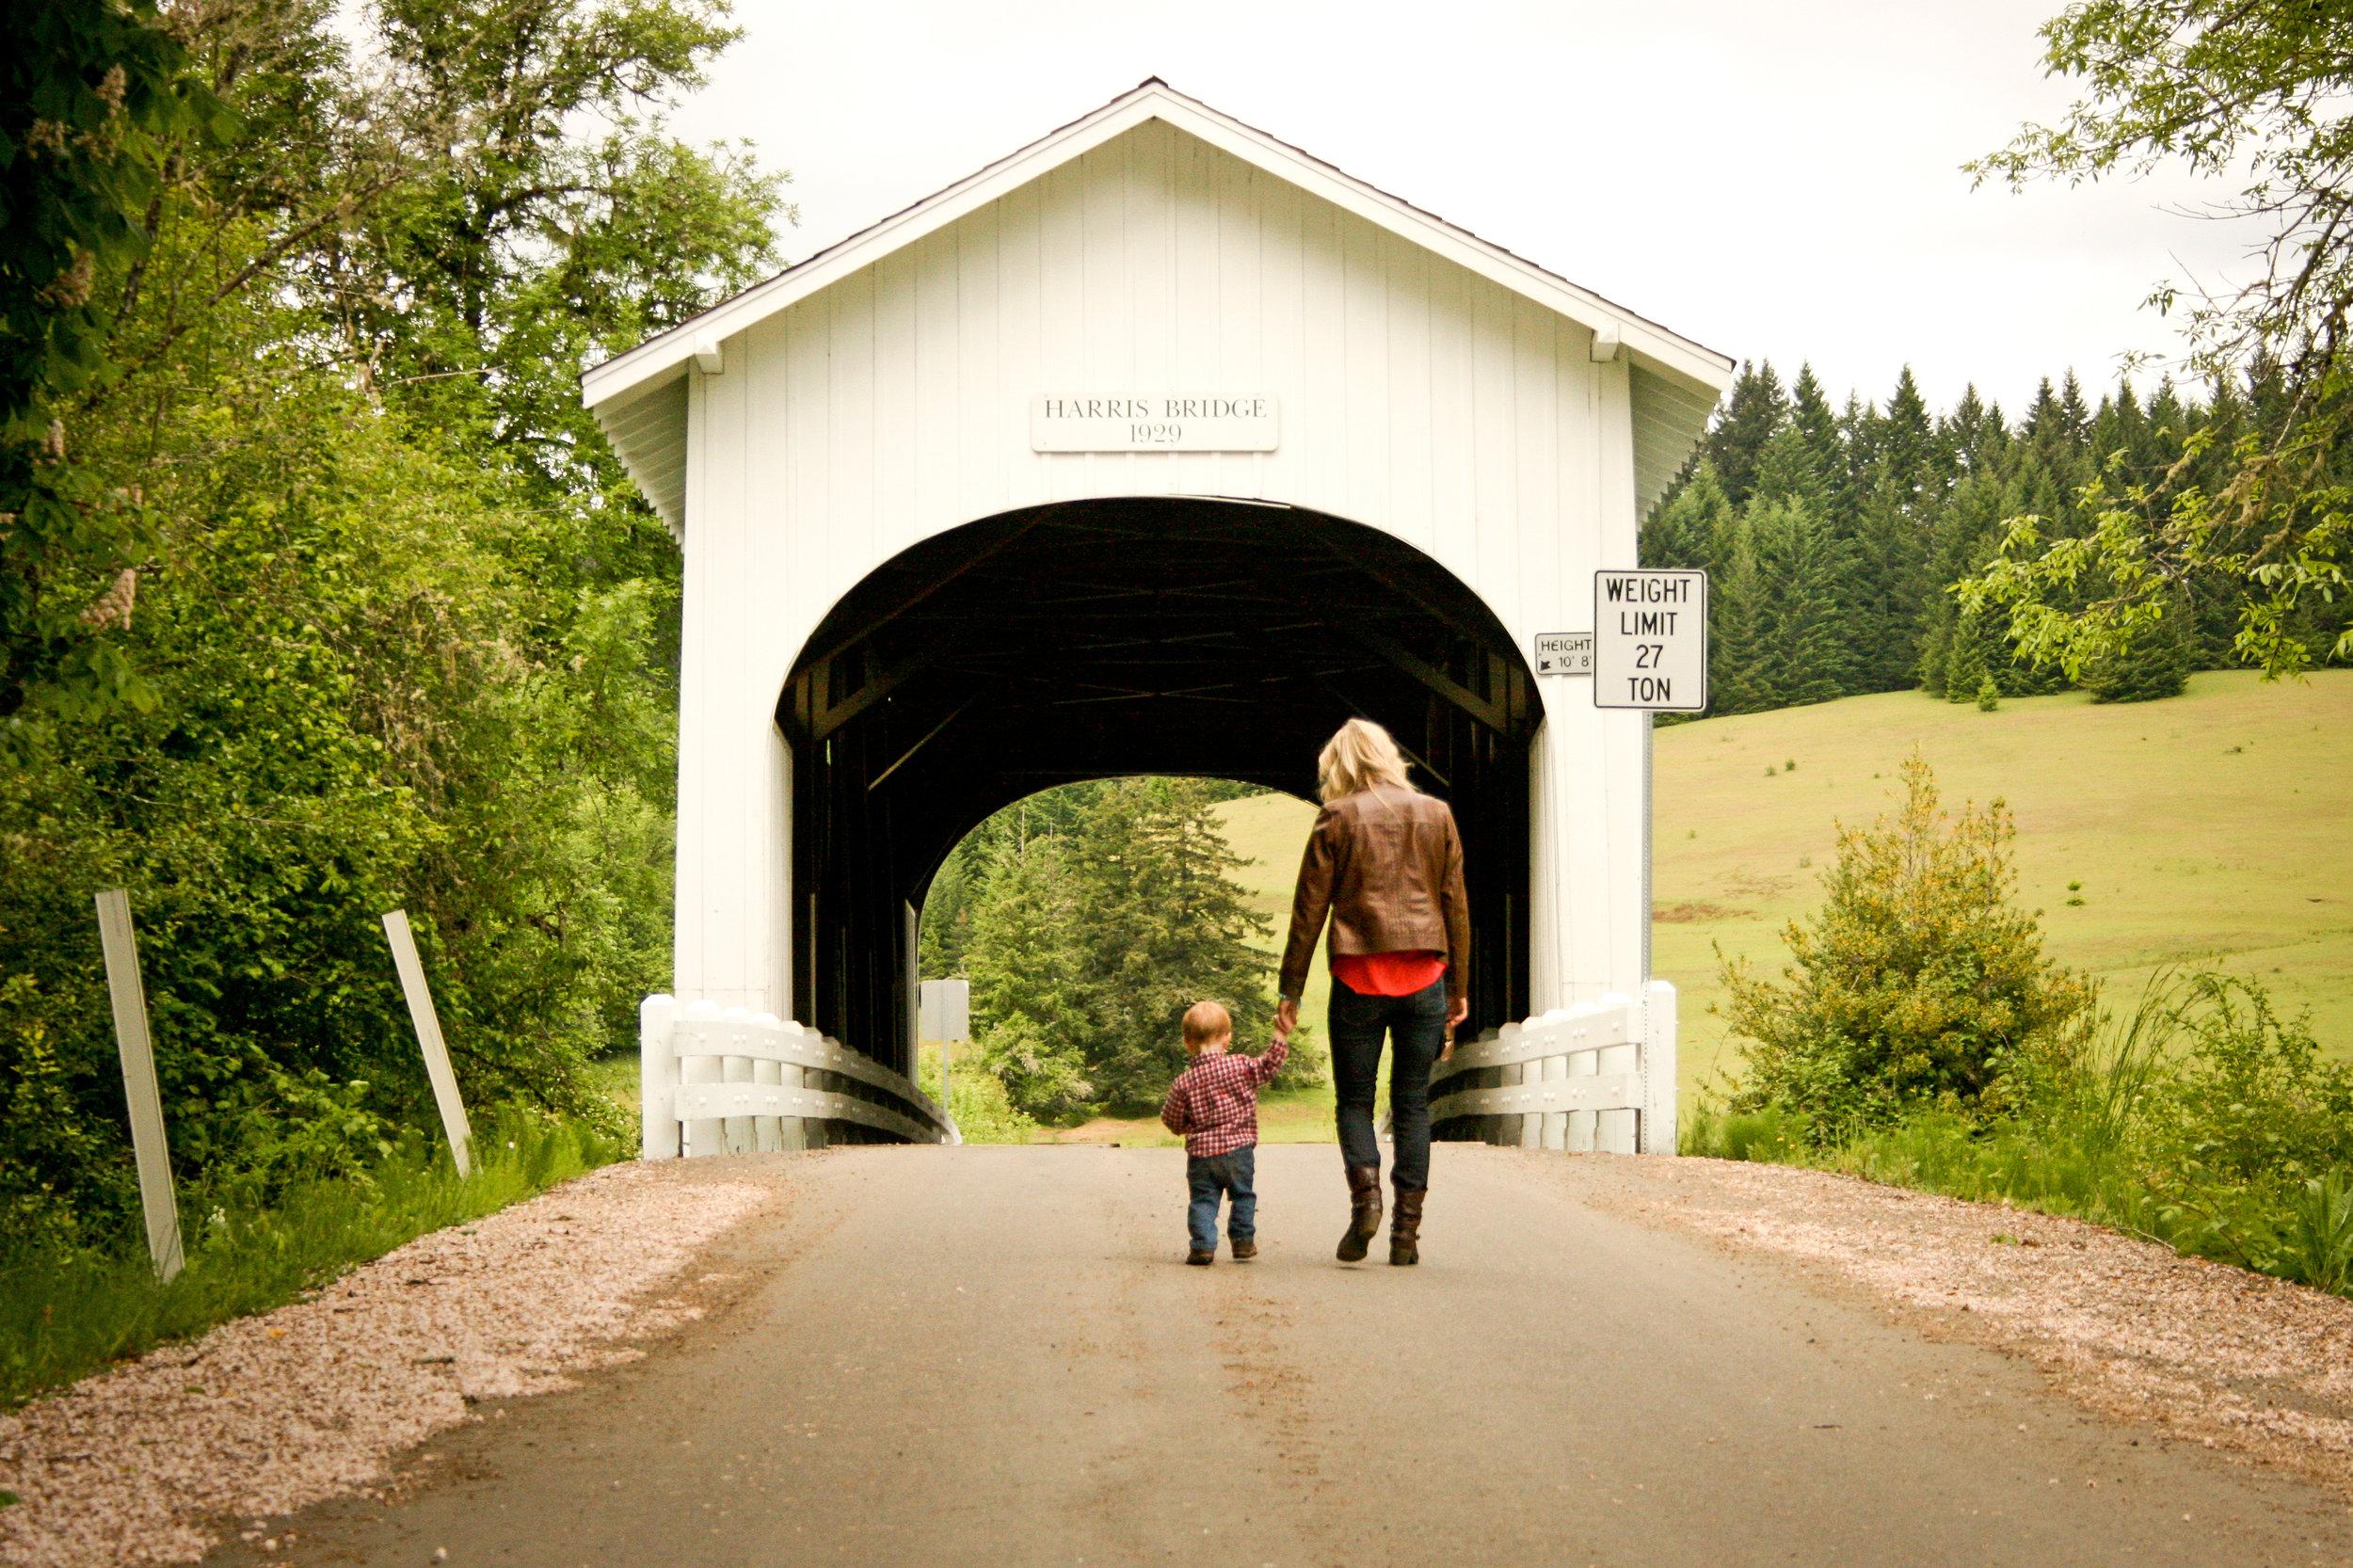 A covered bridge in the Willamette Valley, Oregon.